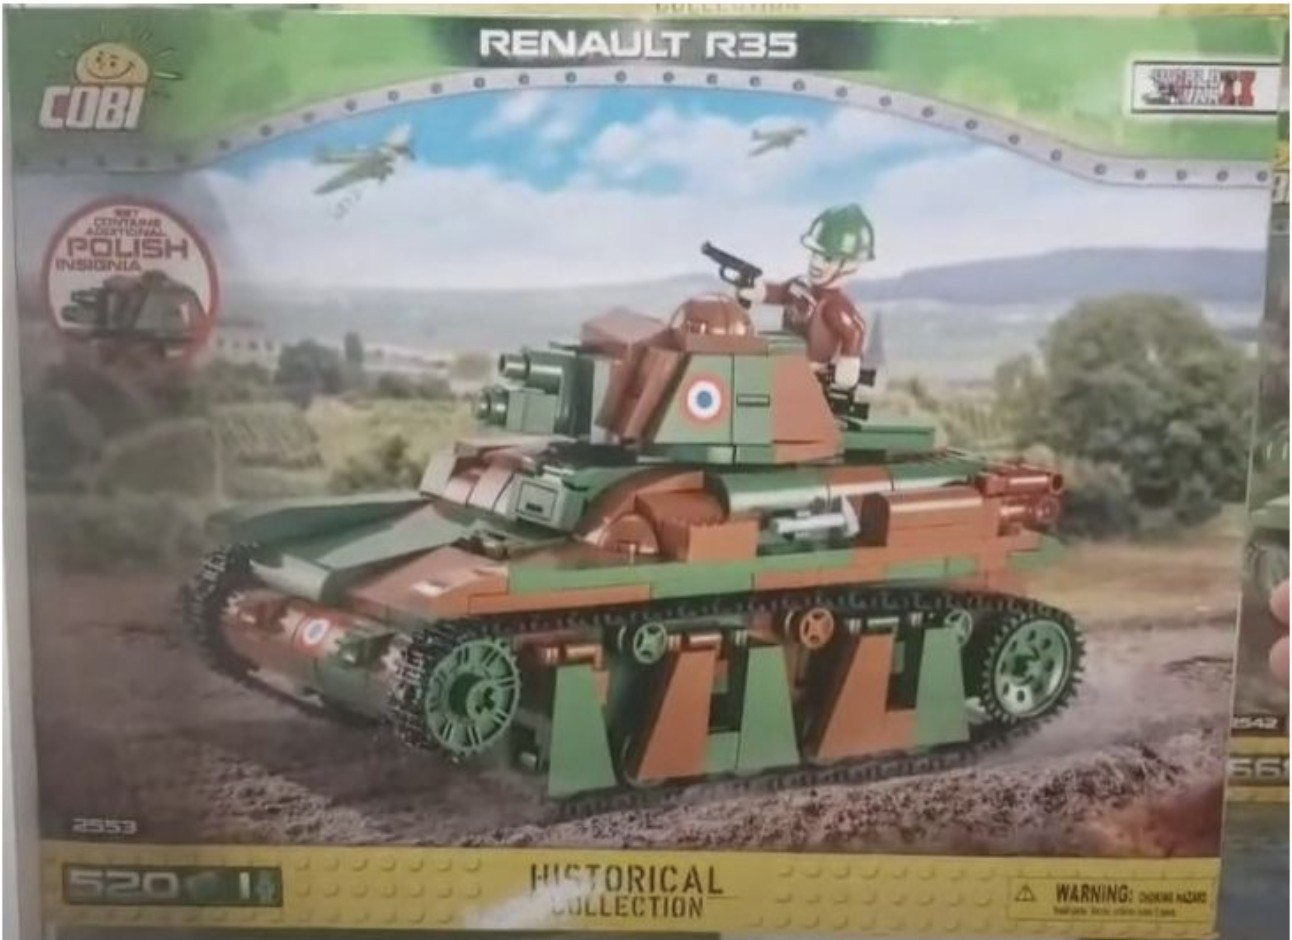 2553 - Renault R35